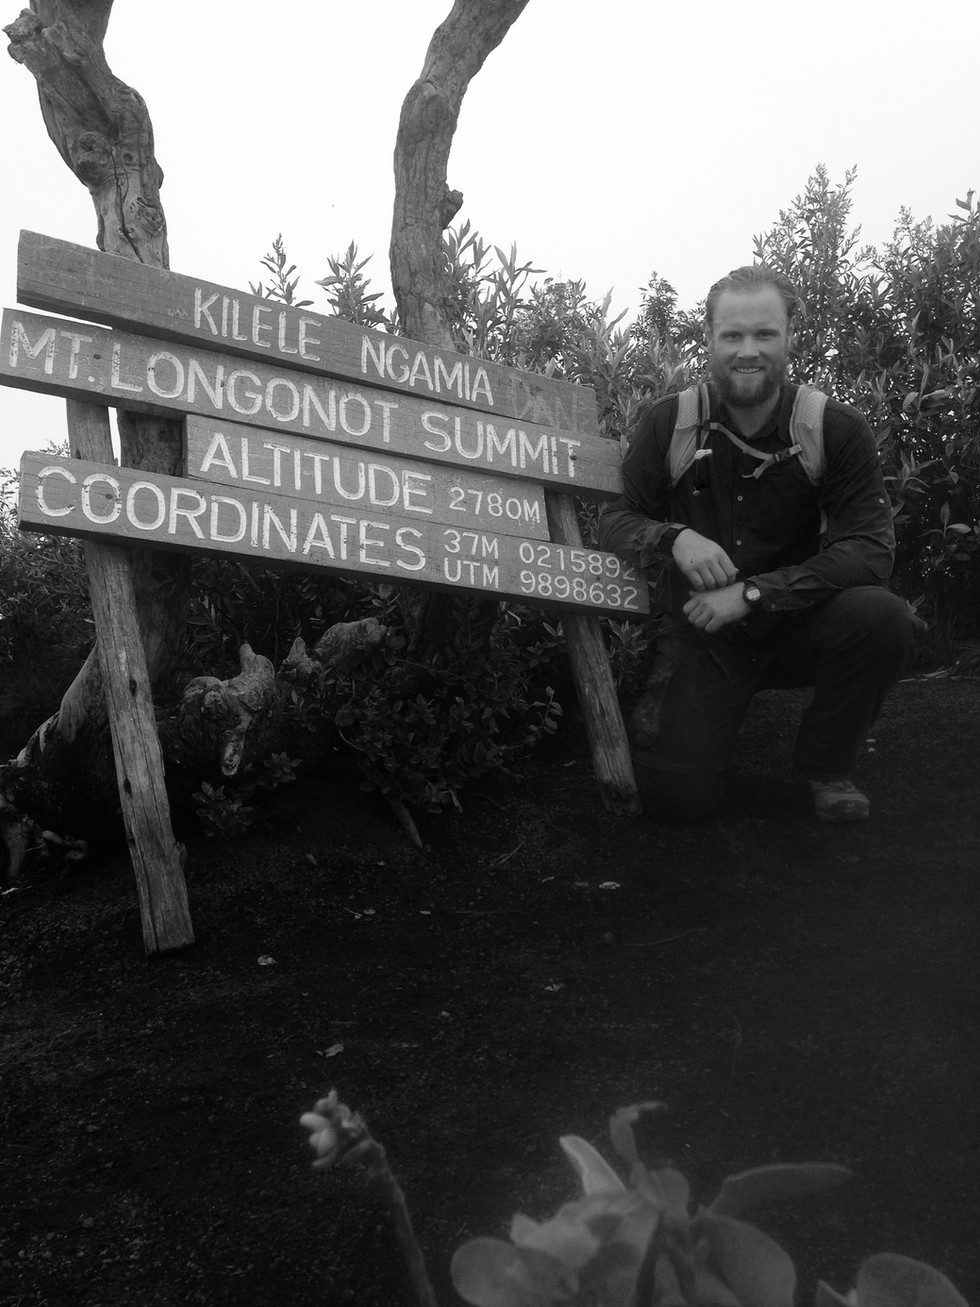 Hiking in Kenya during an SF deployment